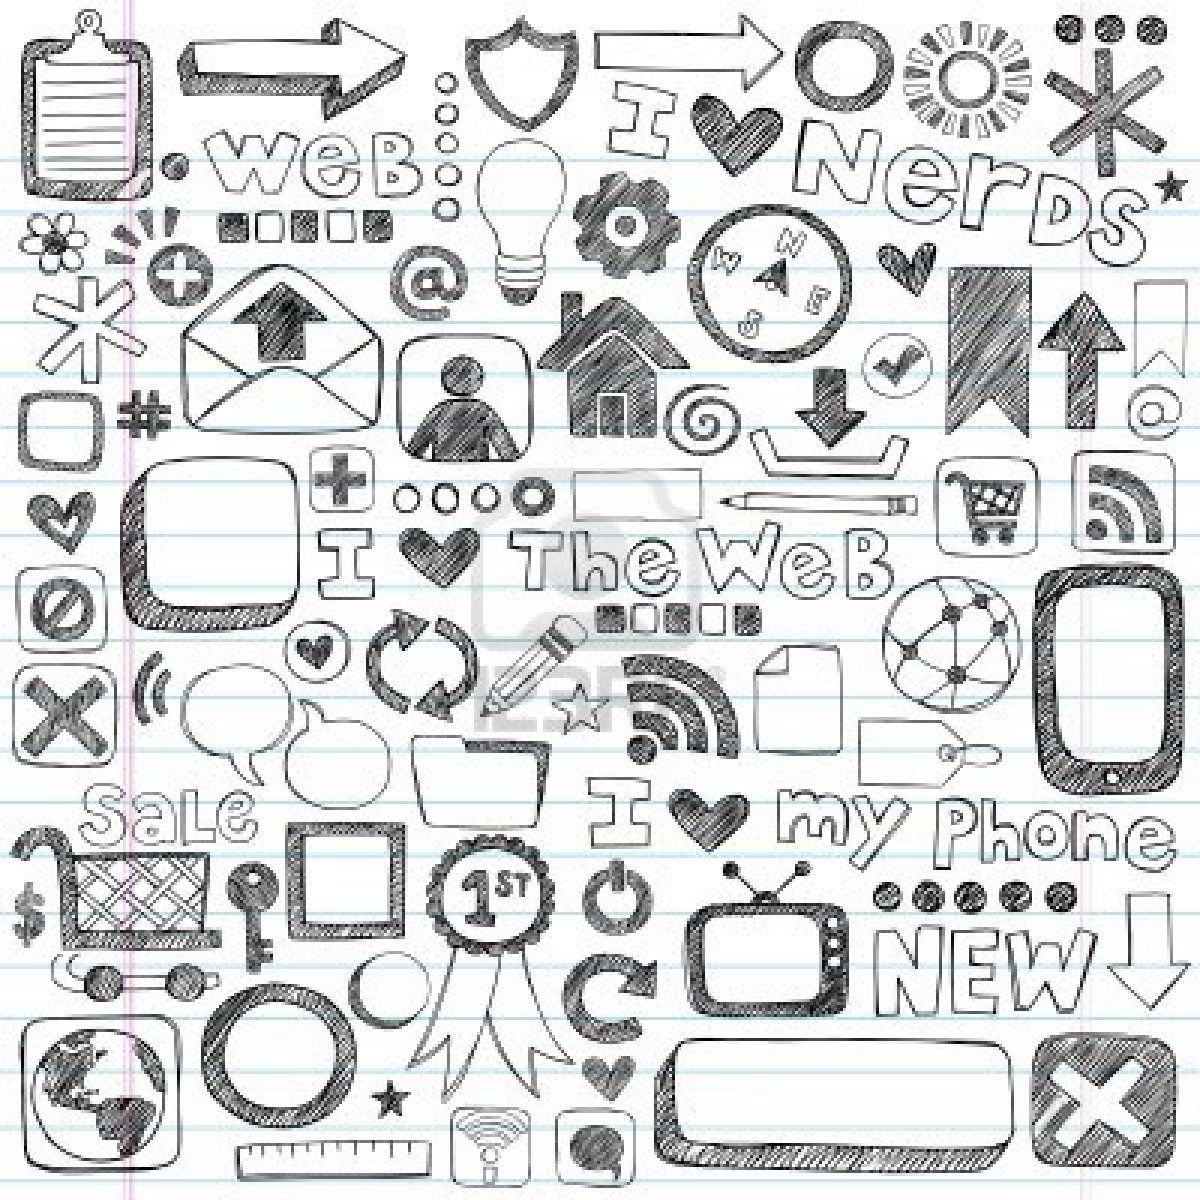 Web Computer Doodle Icon Set Back To School Style Sketchy Doodle Icon Notebook Doodles Doodles